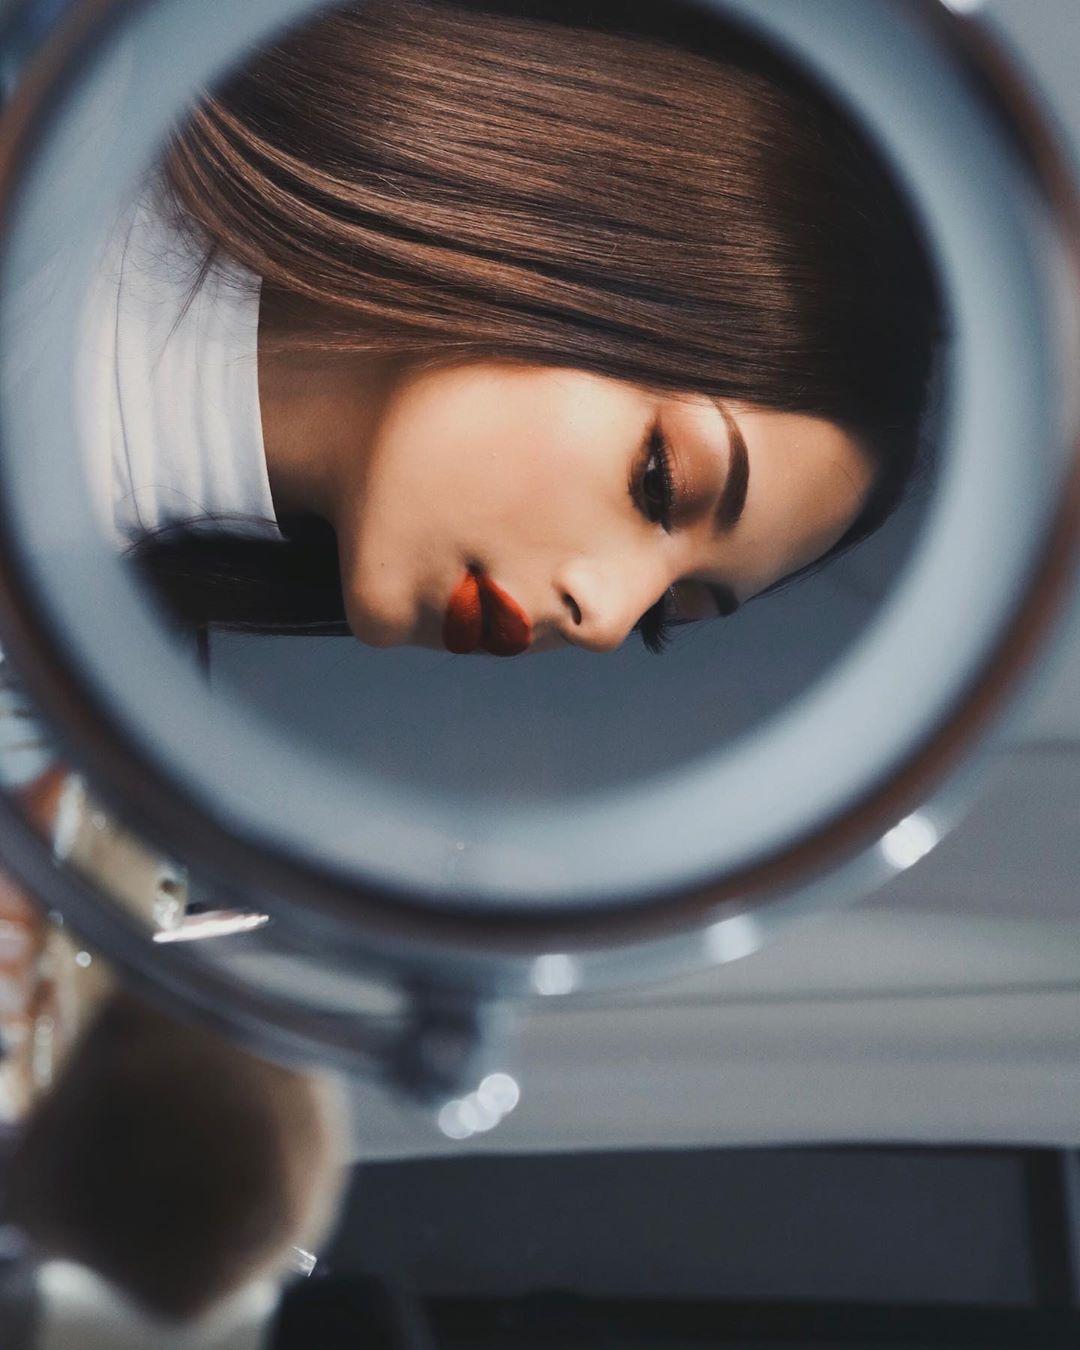 ¡Hazlo! 🔓 - - - - Makeup Makeupideas Makeupideas - Makeup Ideas